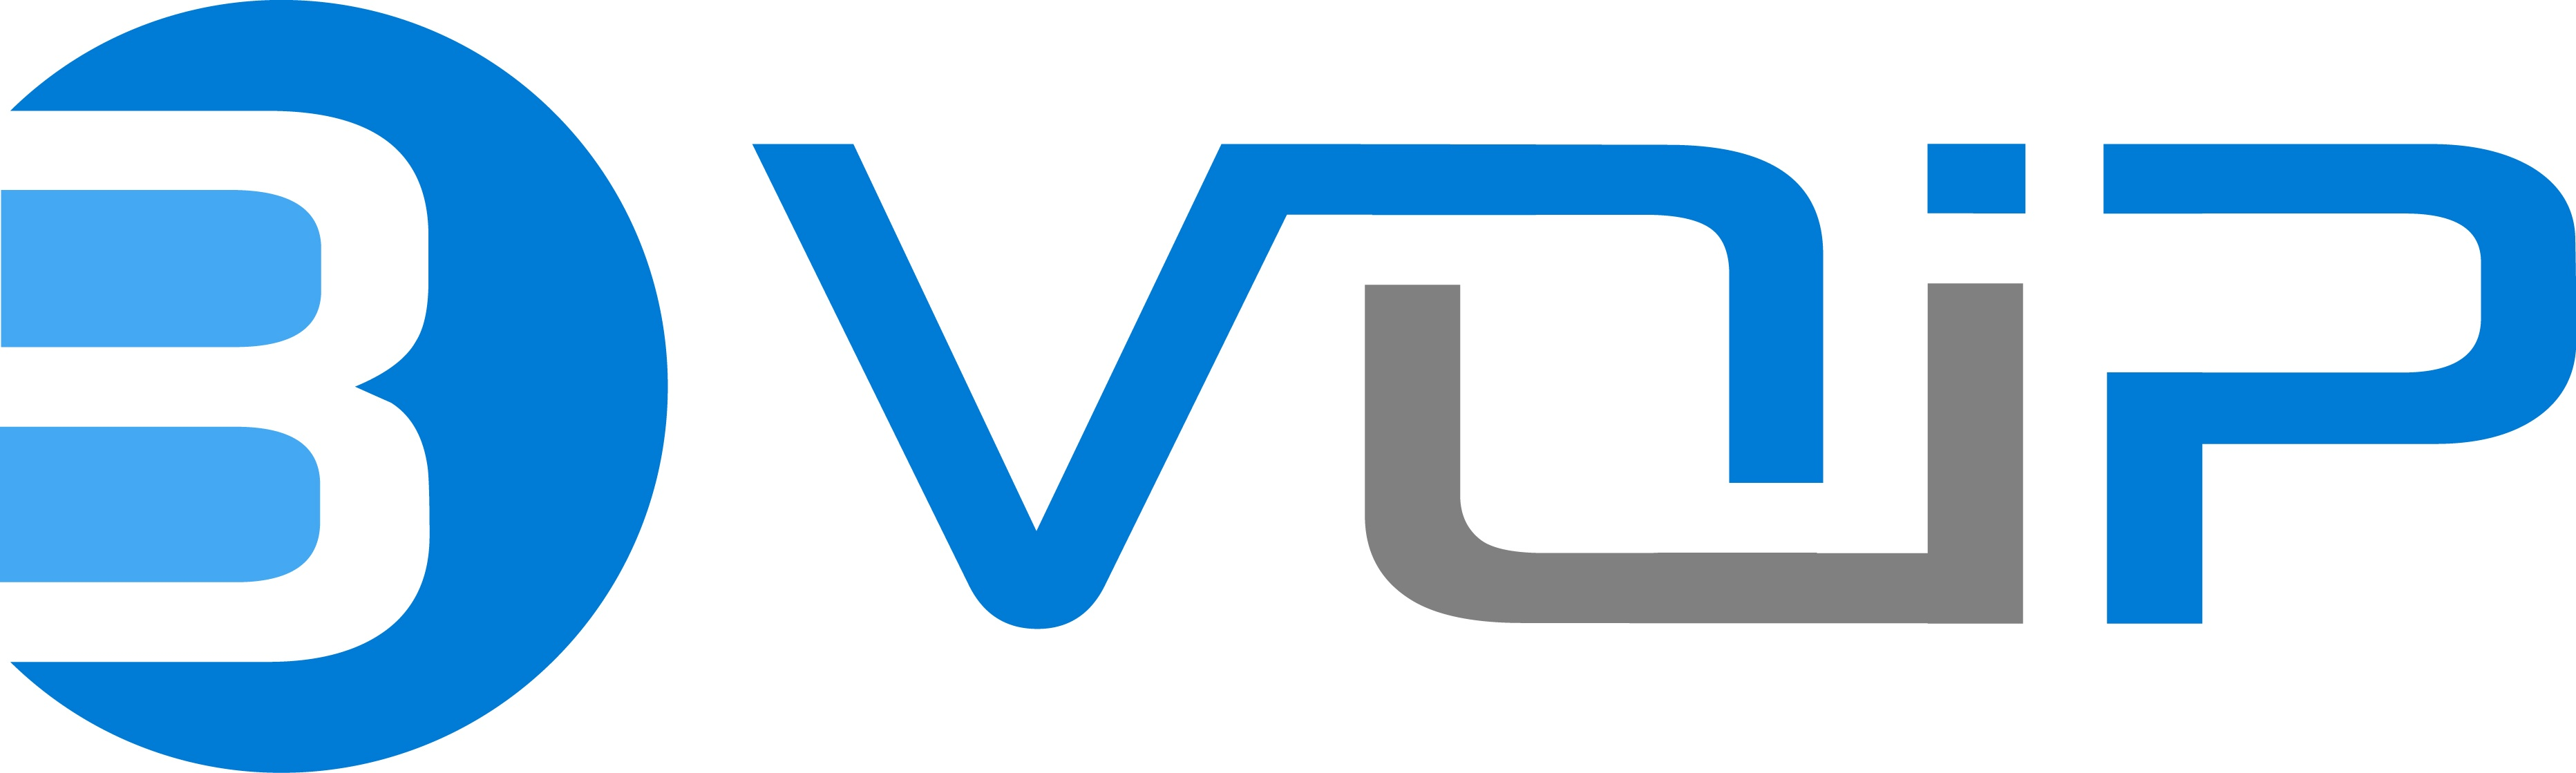 BVOIP_Sourcefiles_1.jpg